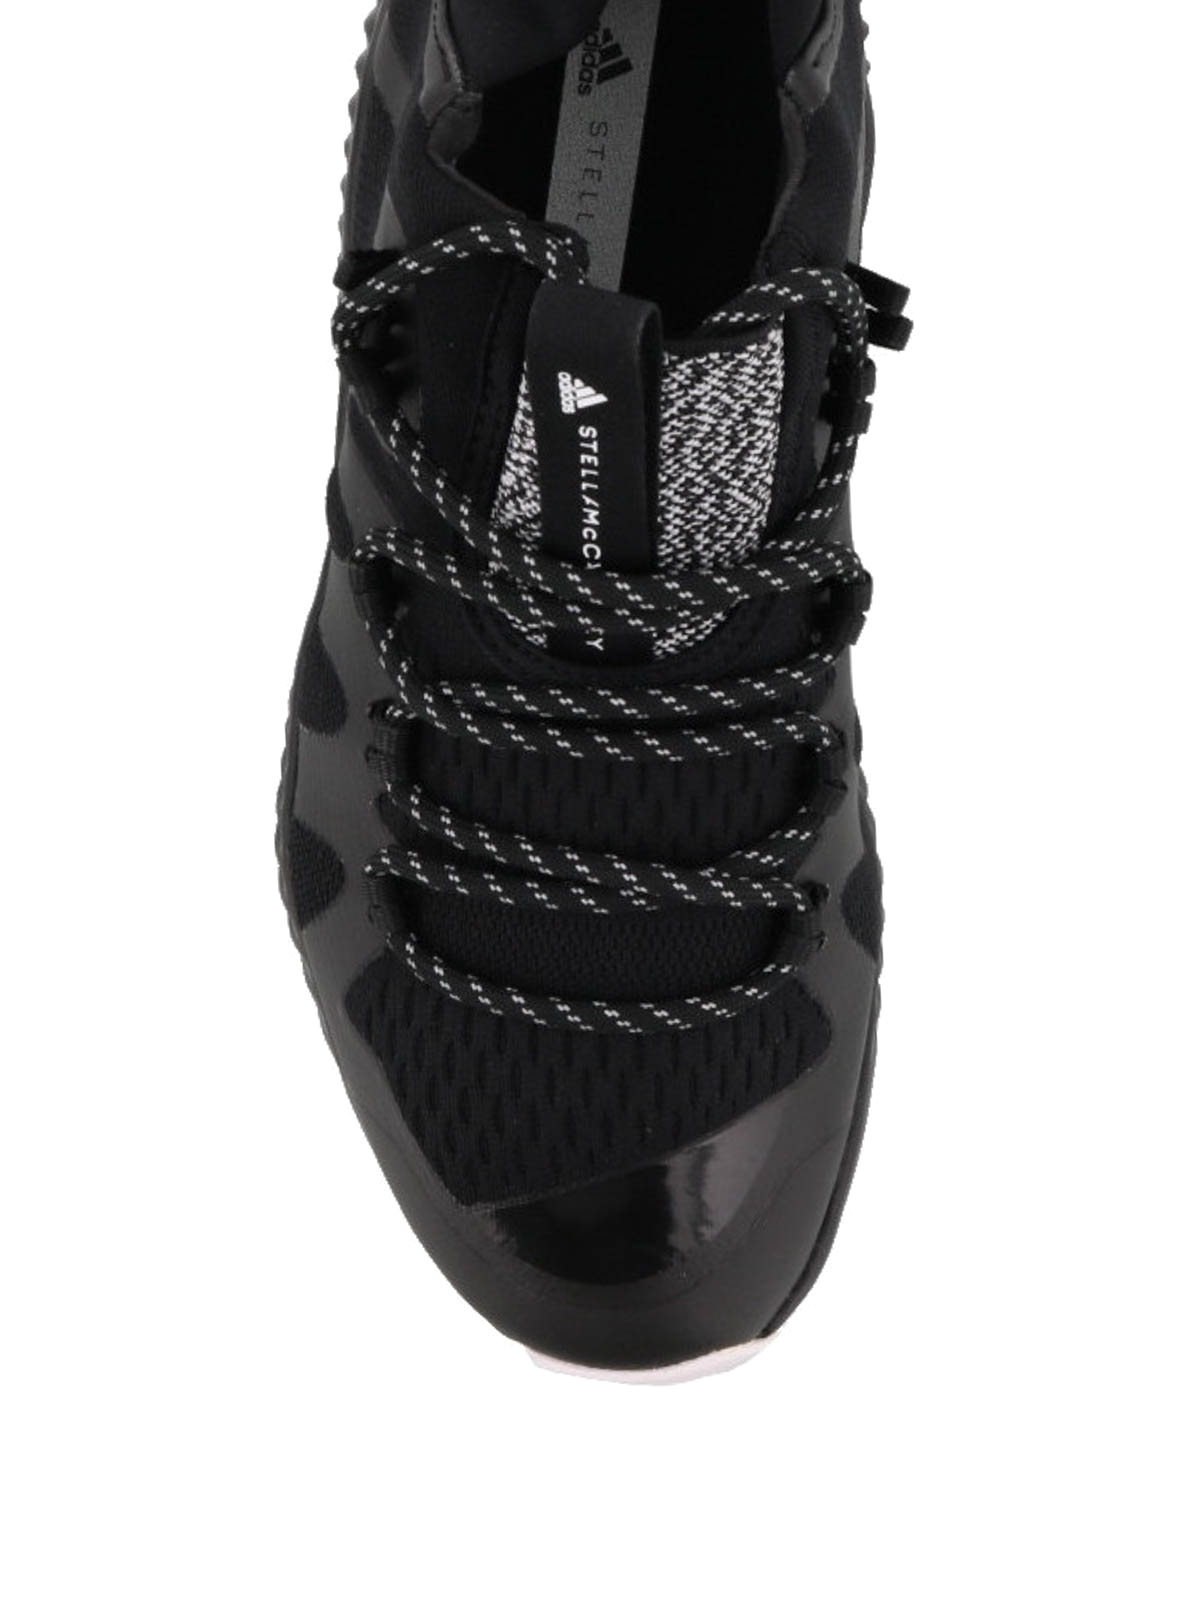 Zapatillas Adidas Mccartney Stella Crazytrain Bounce By wONknX08P